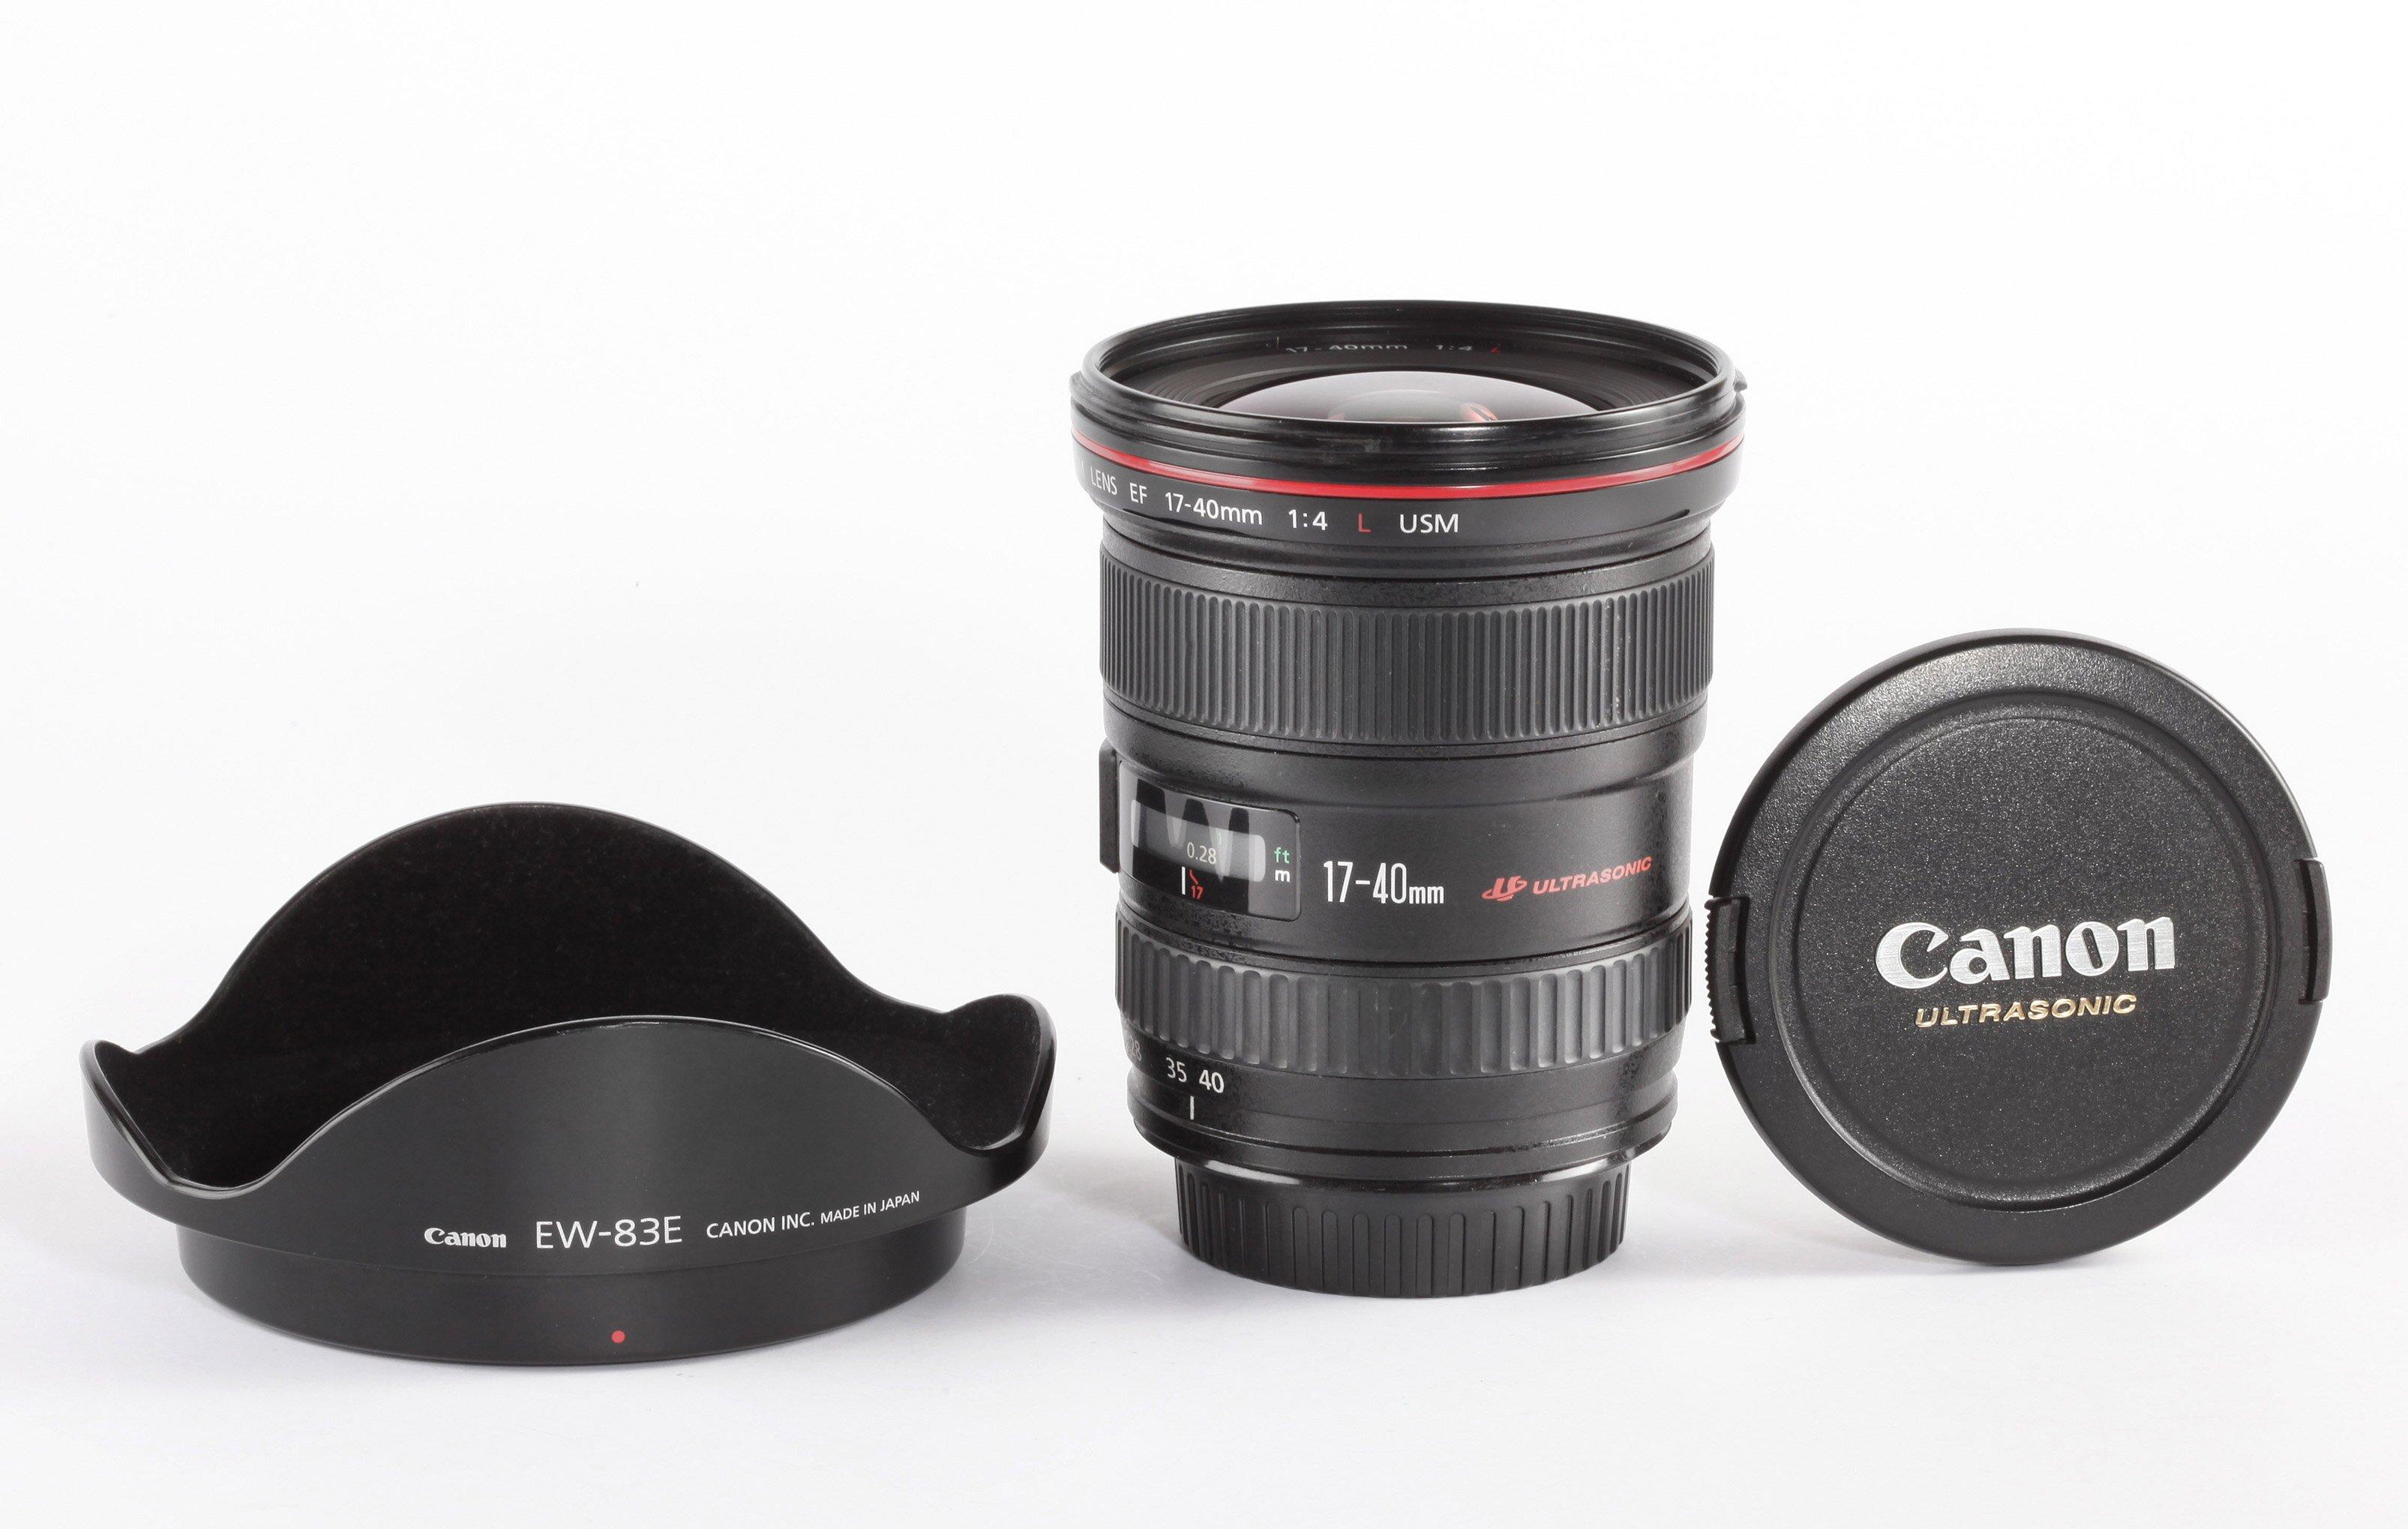 Canon EF 4/17-40mm L USM